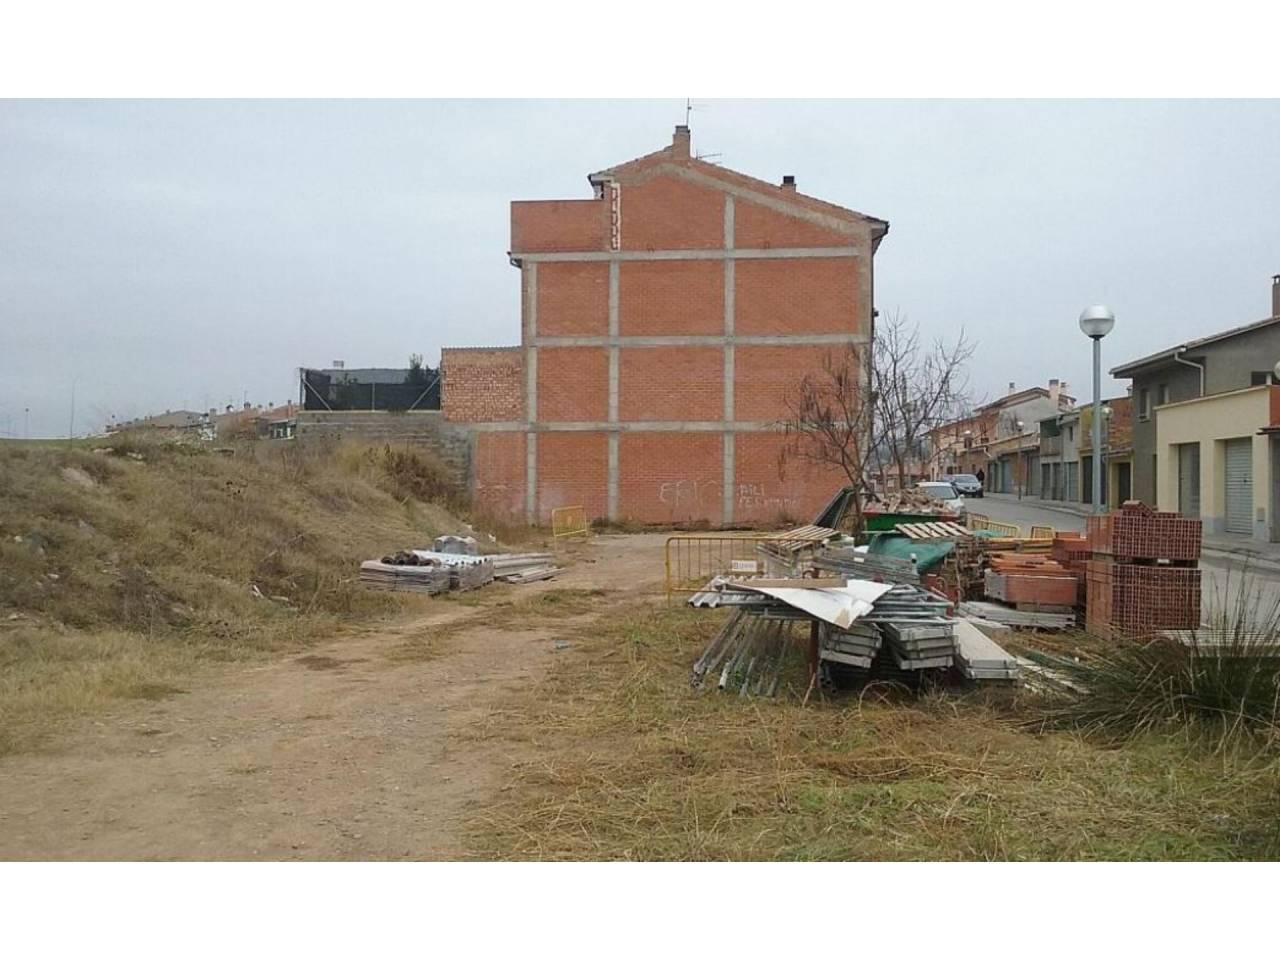 Terrain urbain  Calle sant marc, 0. Solar de 780 m2. uso mayoritario residencial, de 1768 m2 de edif